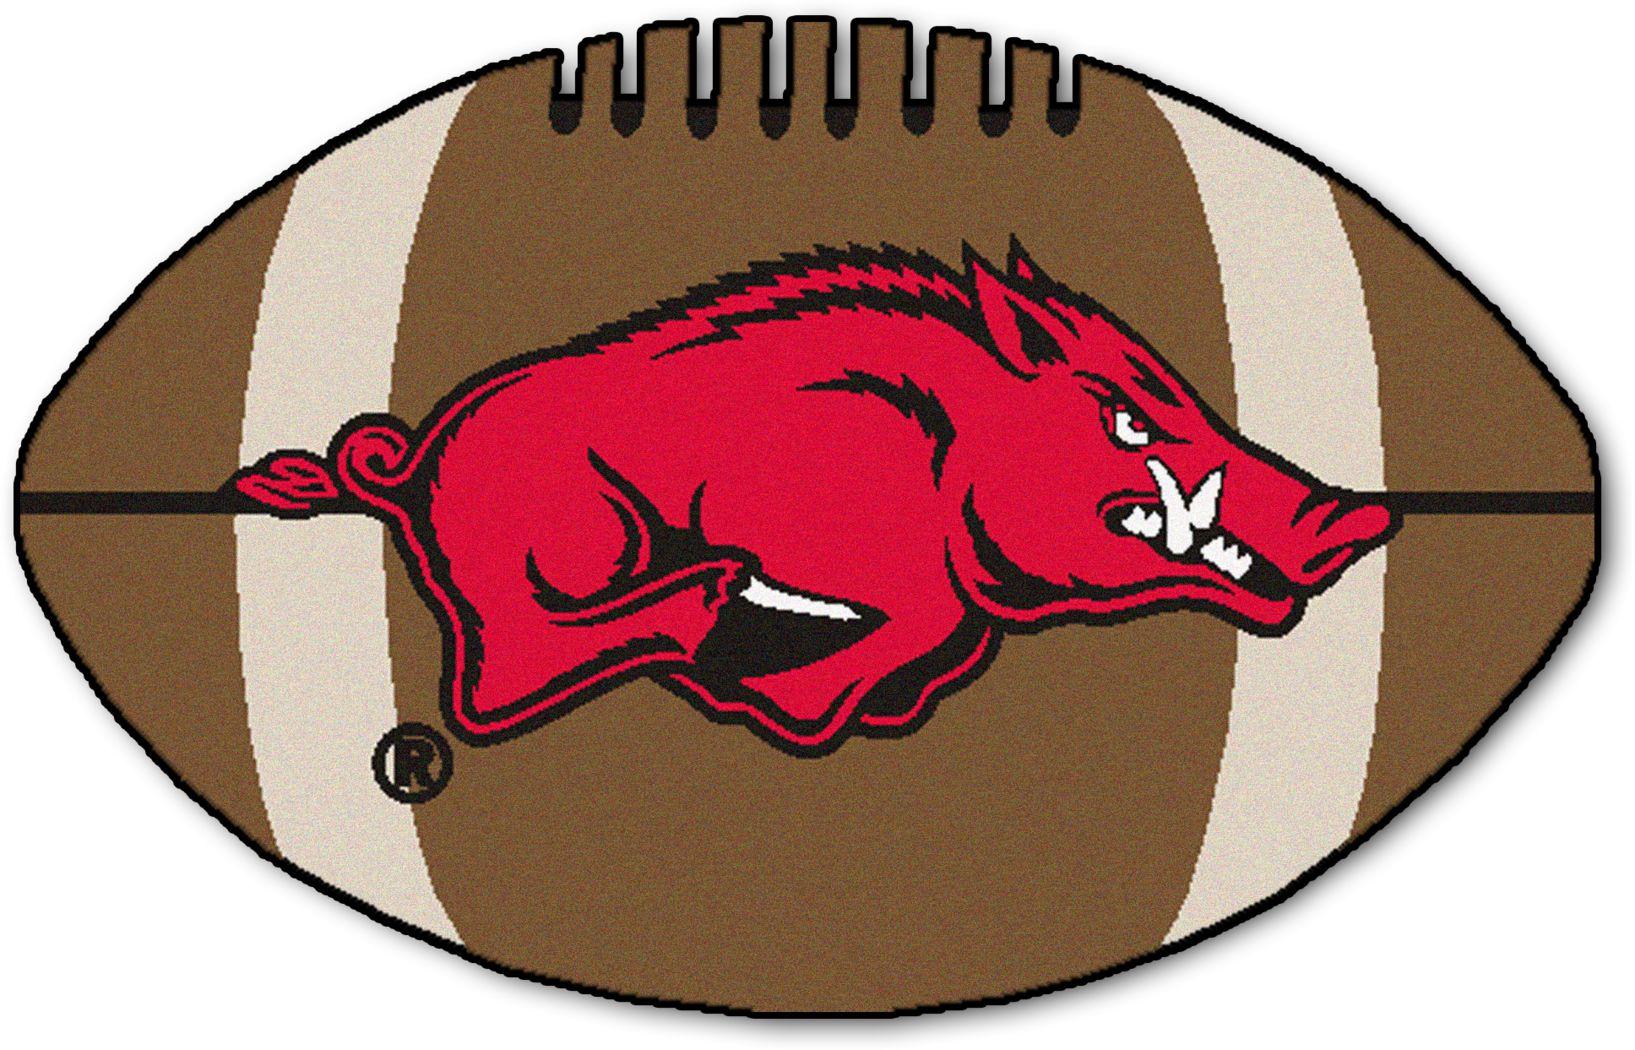 "NCAA Football Mascot University of Arkansas 1'6"" x 1'10"" Rug"